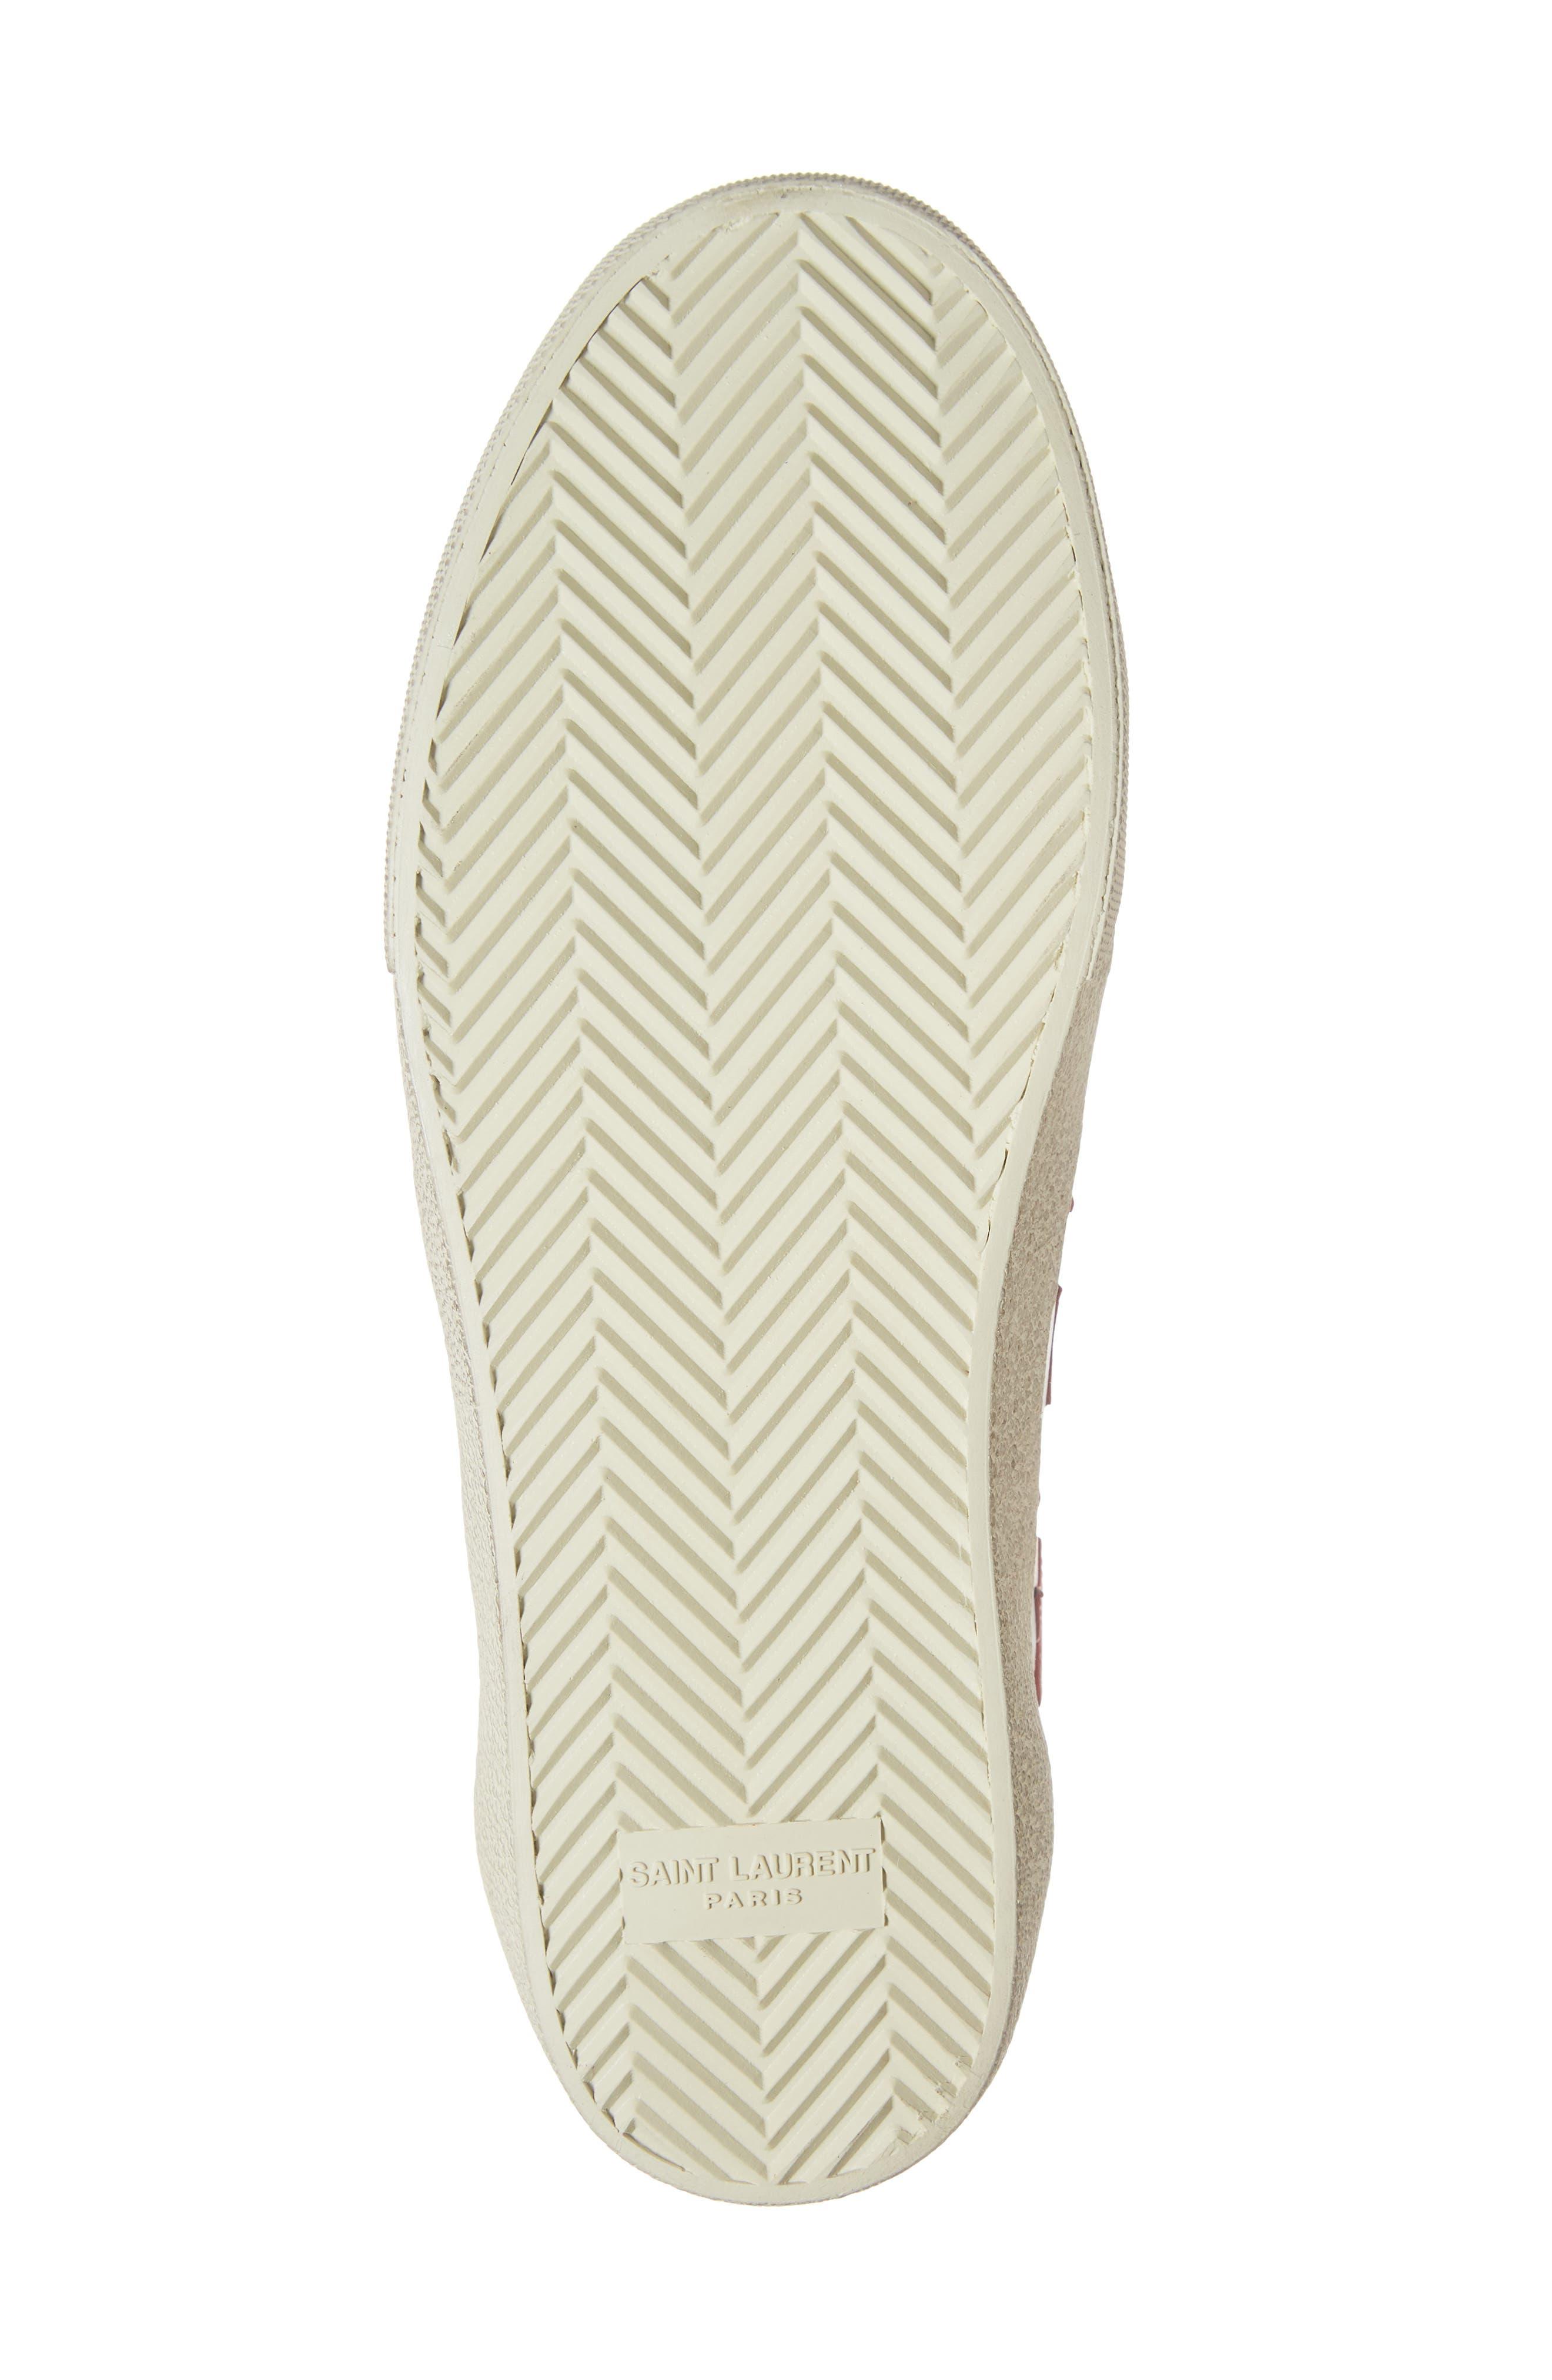 SAINT LAURENT,                             Star Low-Top Sneaker,                             Alternate thumbnail 6, color,                             WHITE/ MULTI